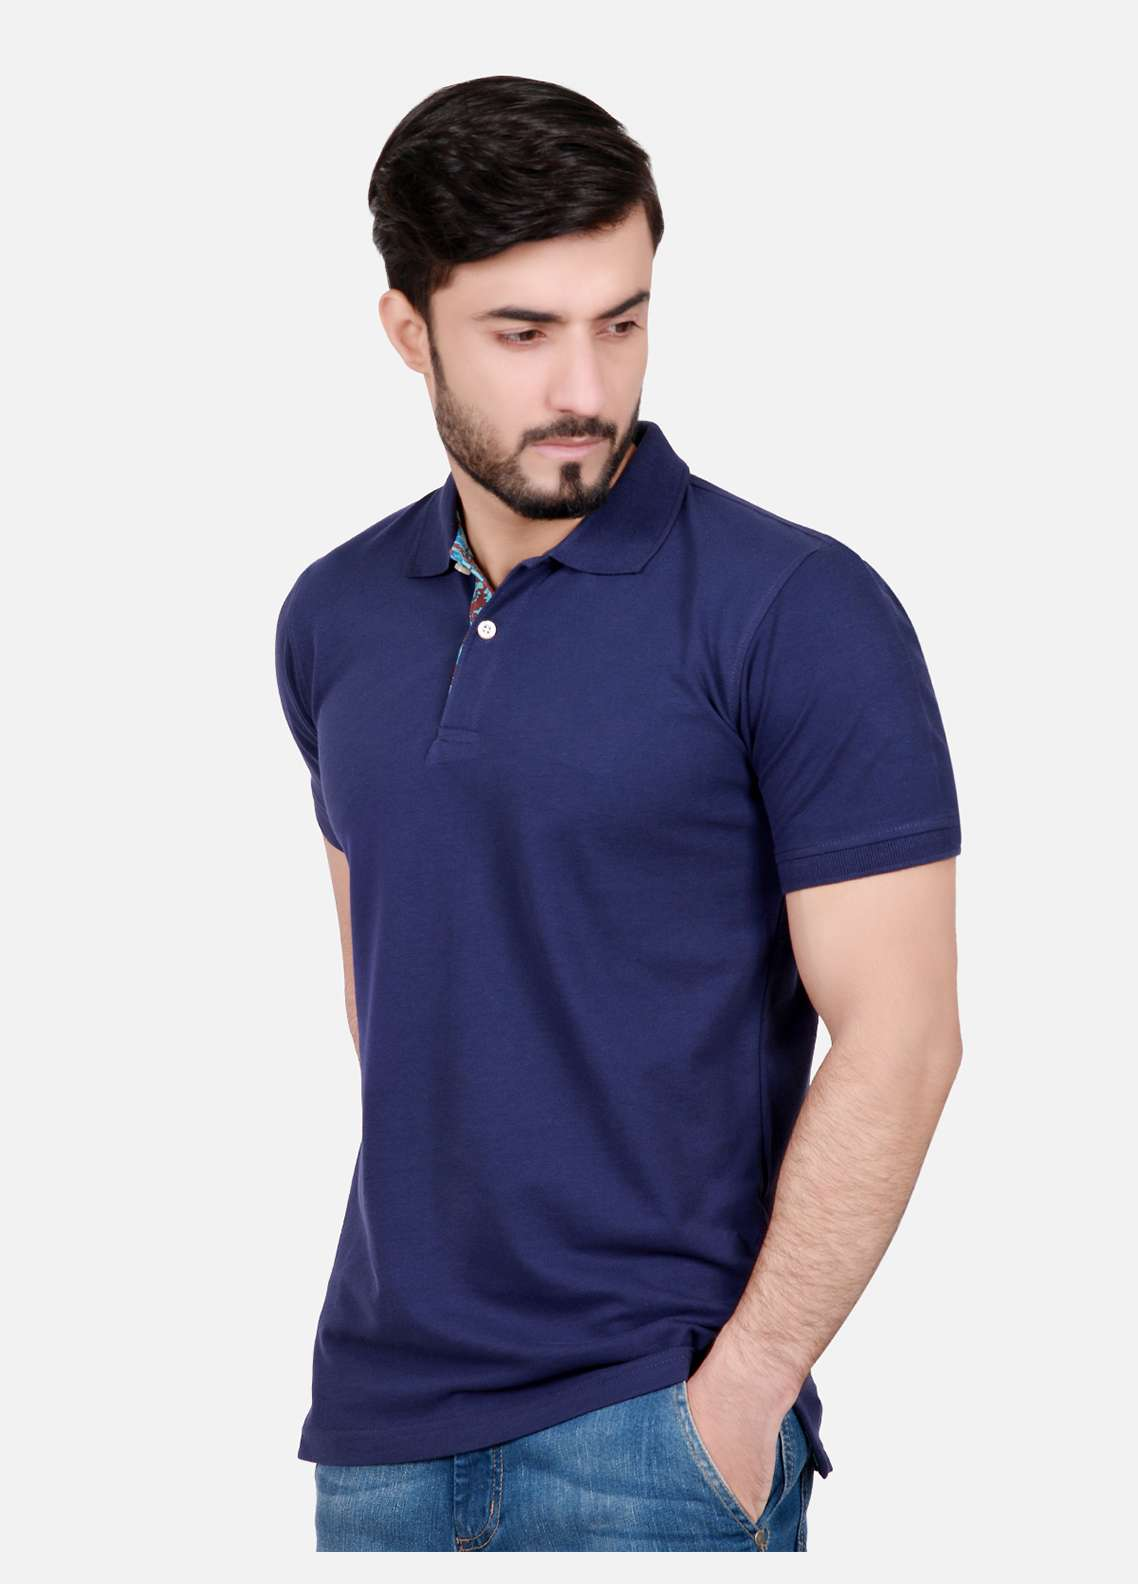 Furor Cotton Polo Men T-Shirts - Navy Blue FRM18PS 016